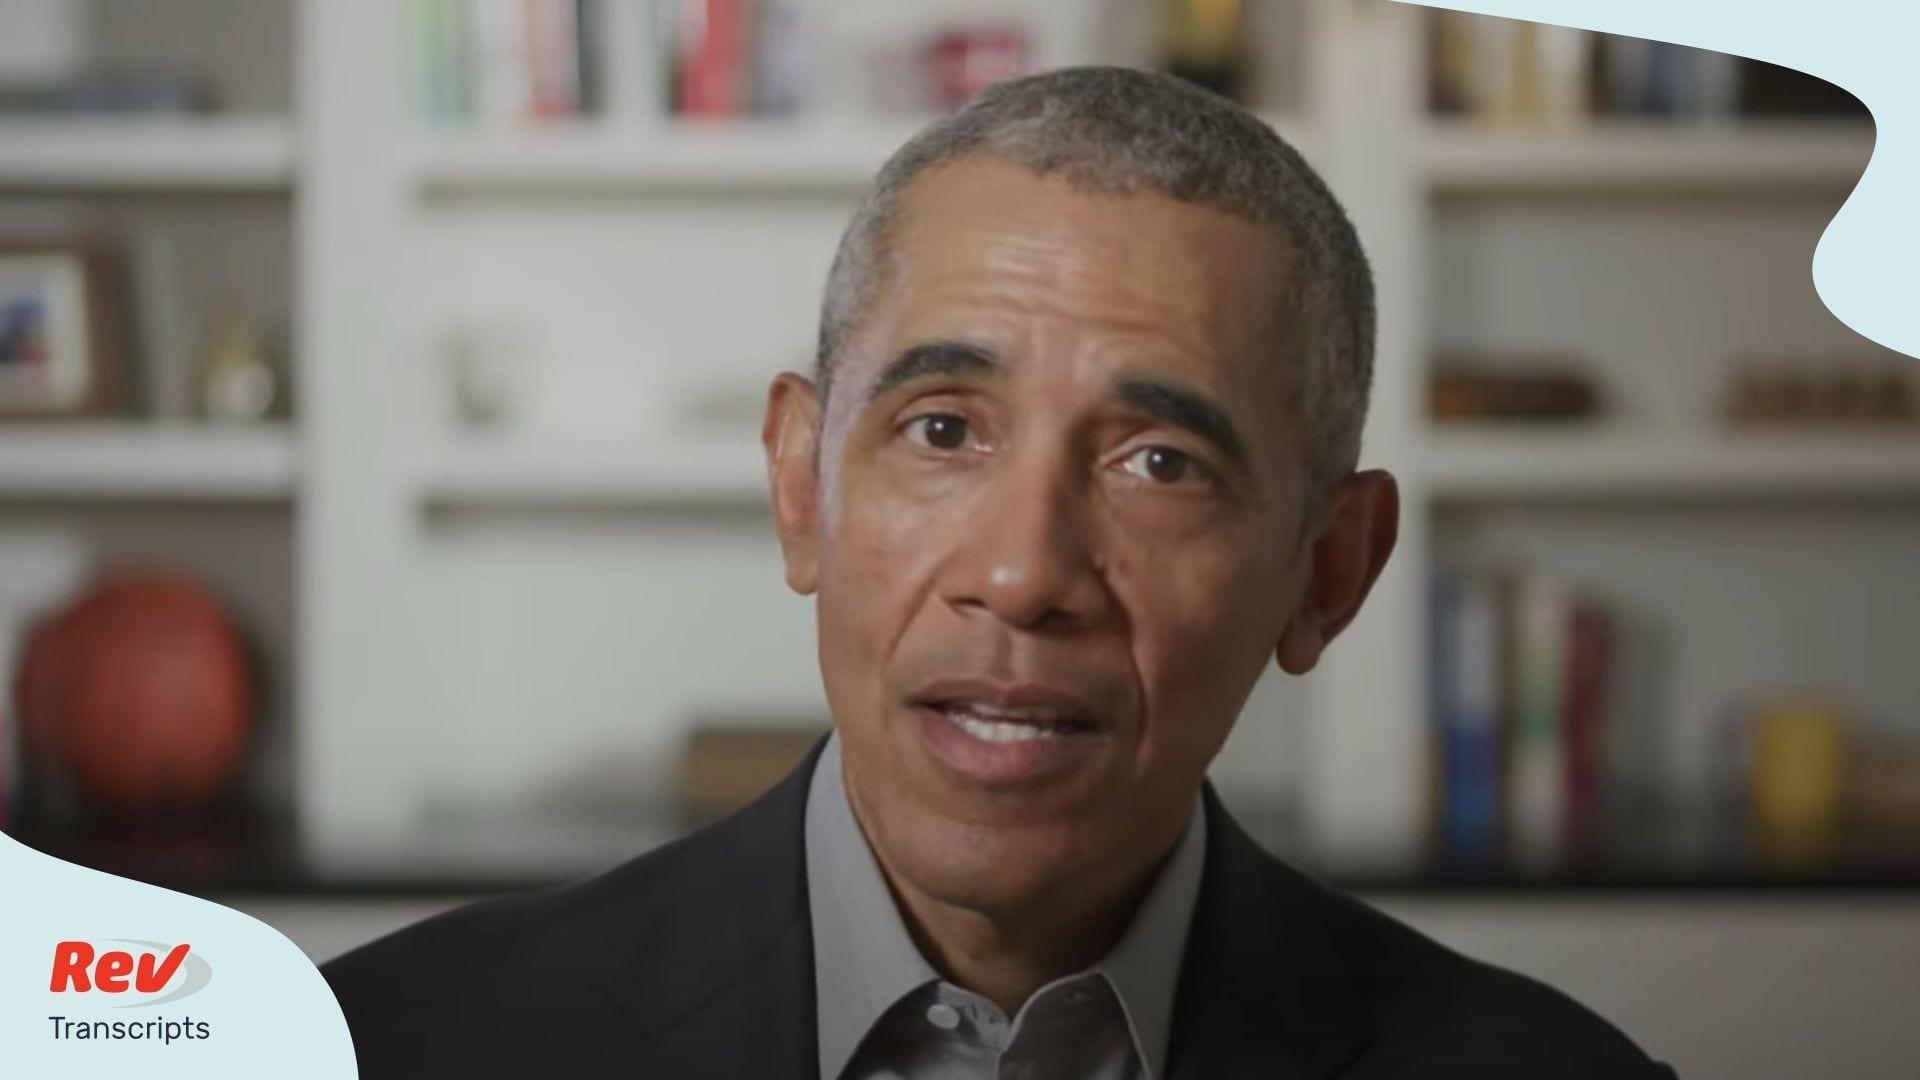 Barack Obama HBCU virtual commencement address